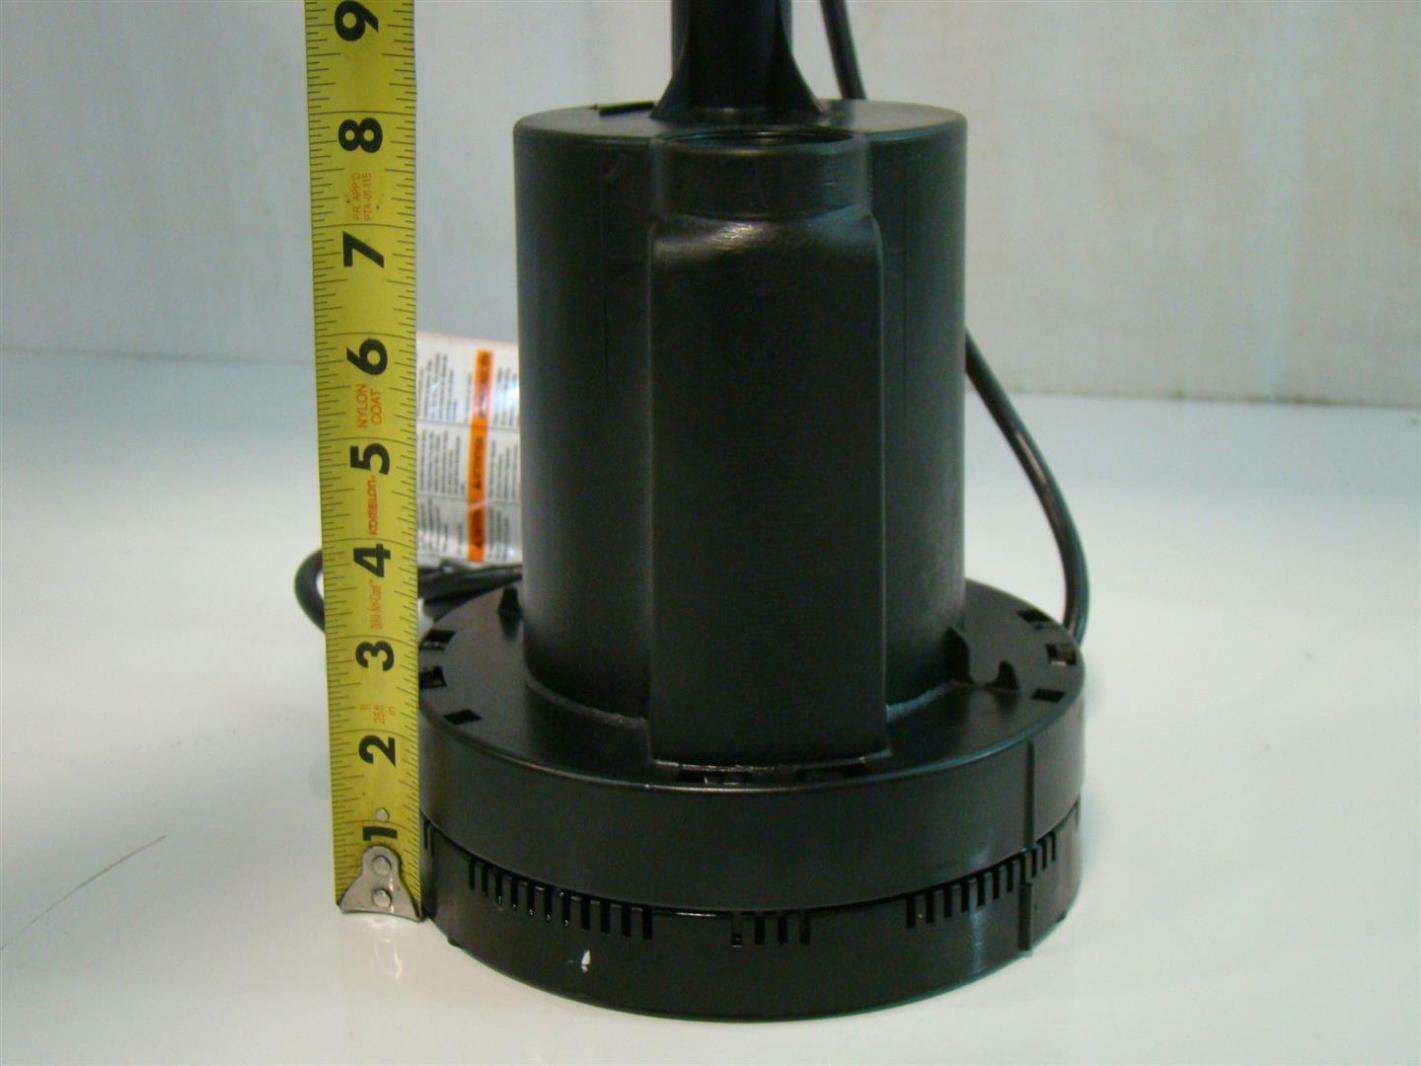 Simer Submersible Utility Pump 115v 6 0a 1 4hp 2305 04 Ebay